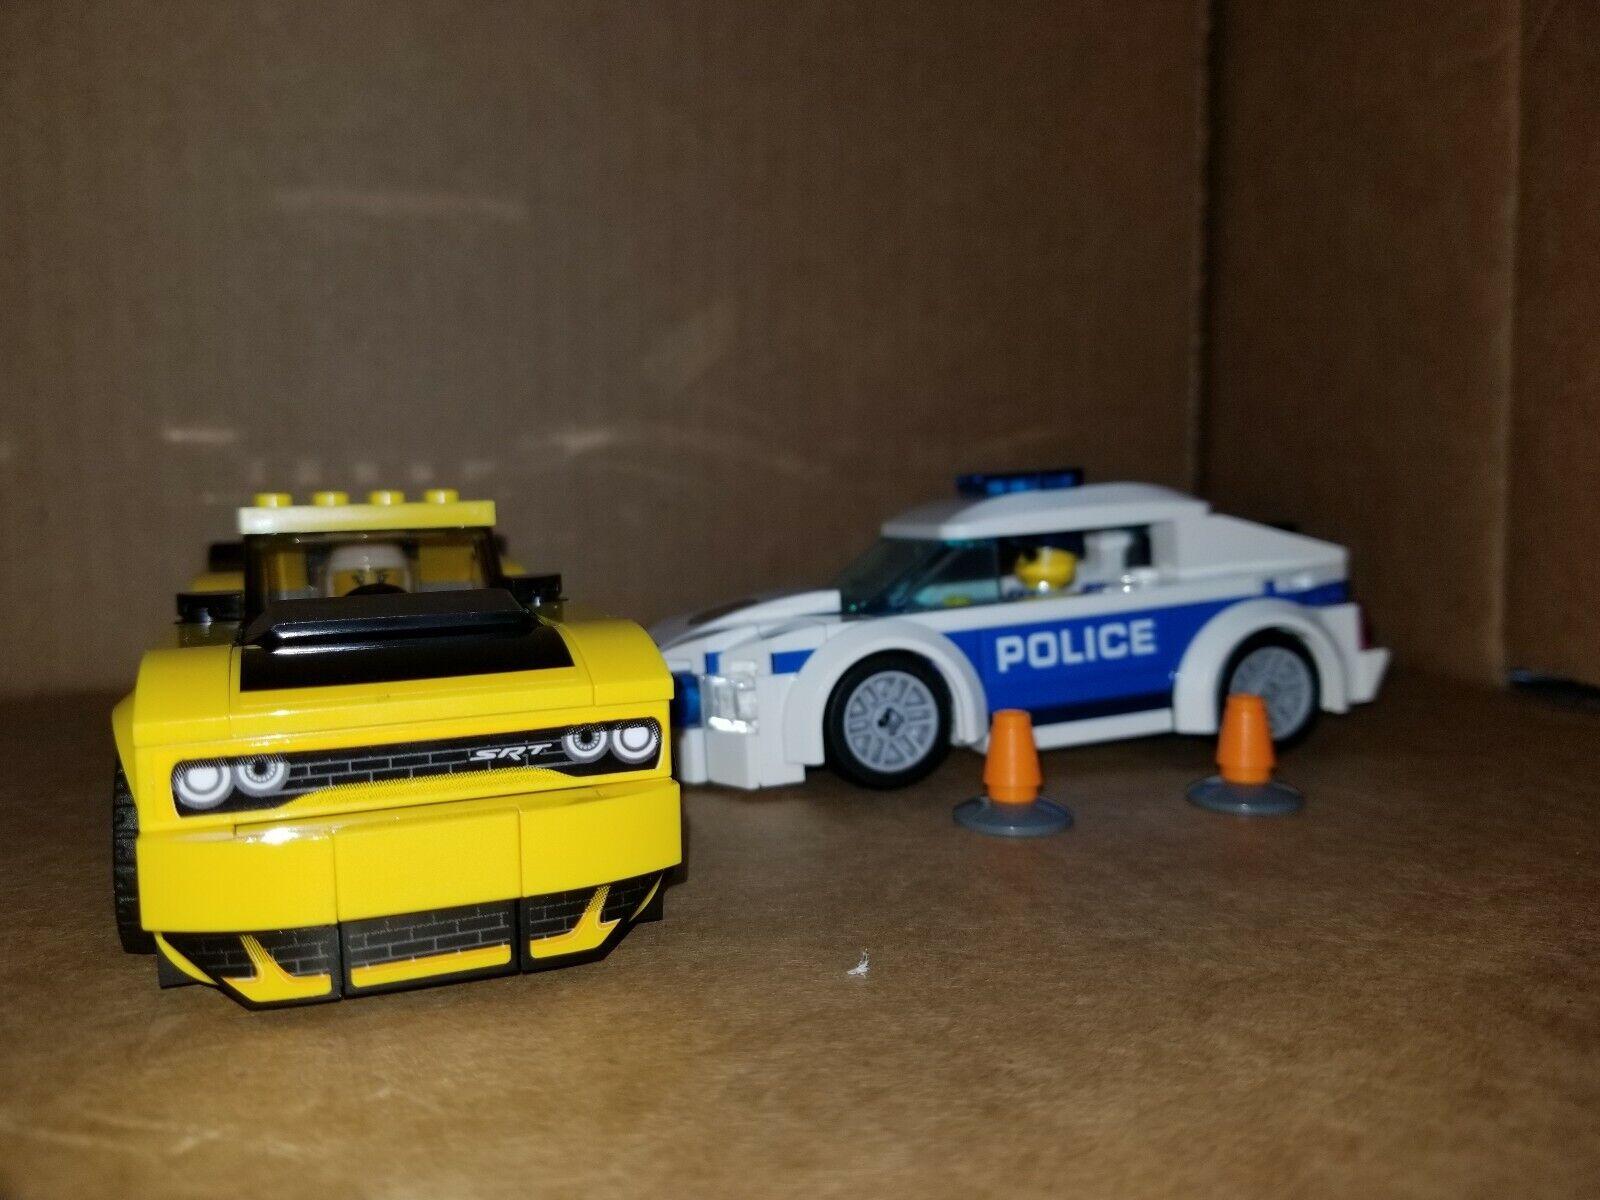 Lego Racing Champions 2018 Dodge Challenger SRT DEMON & City Police Patrol Car